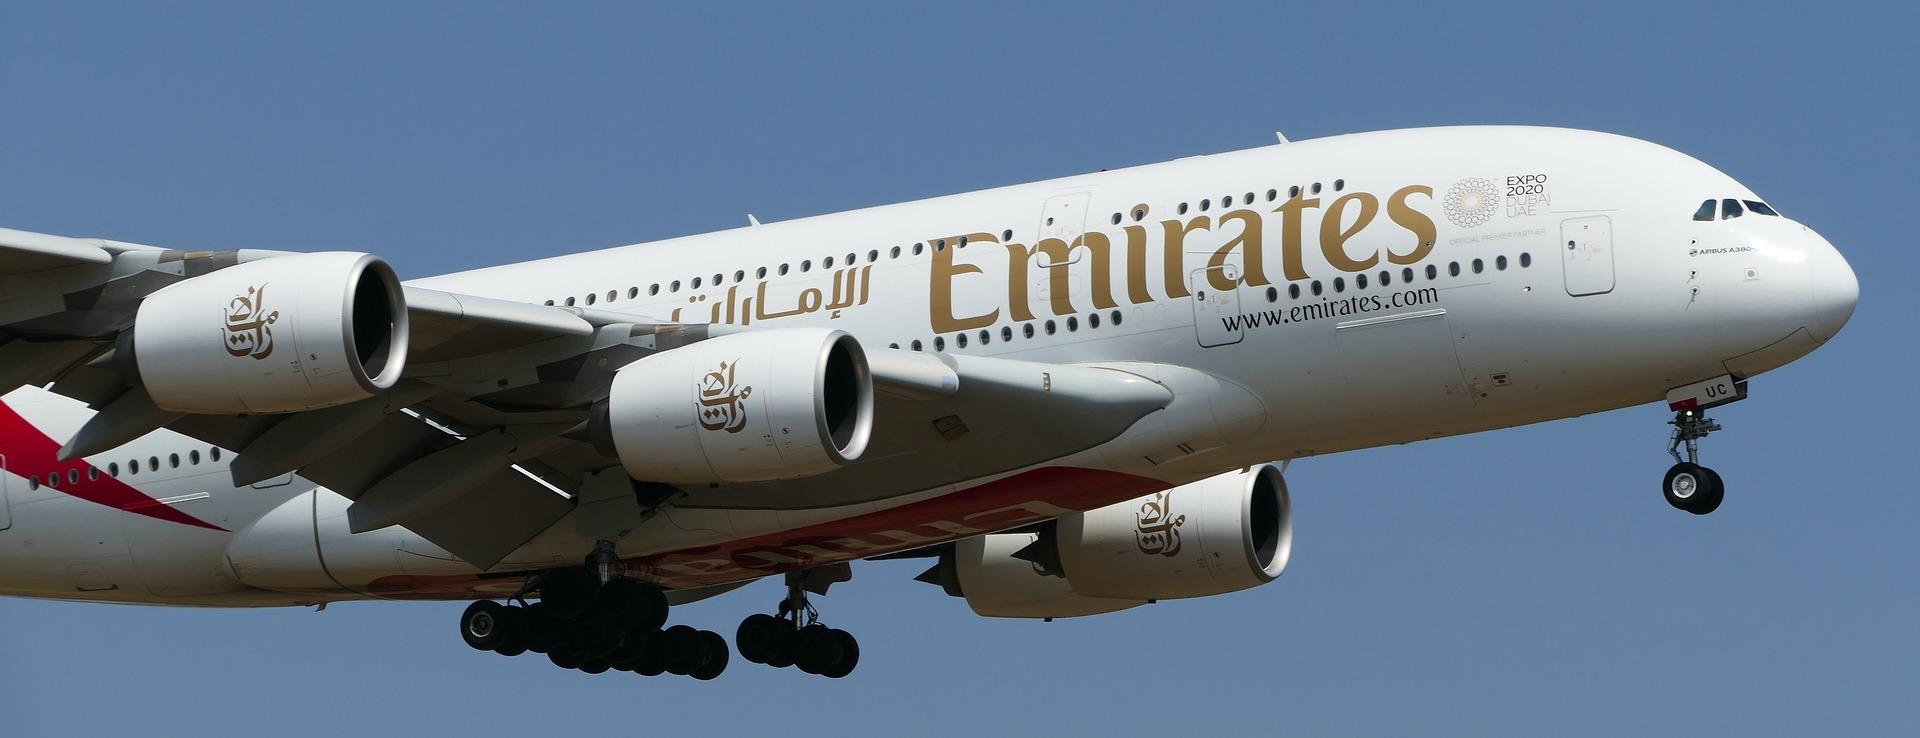 premiere classe emirates - avion de luxe